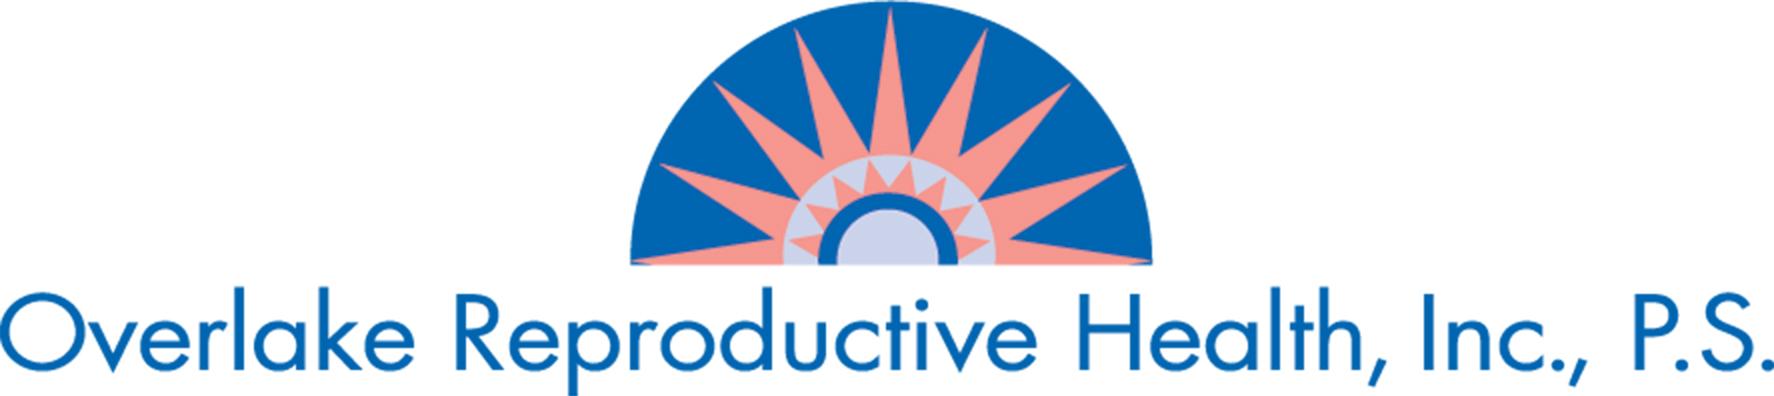 Overlake Reproductive Health Inc., P.S.